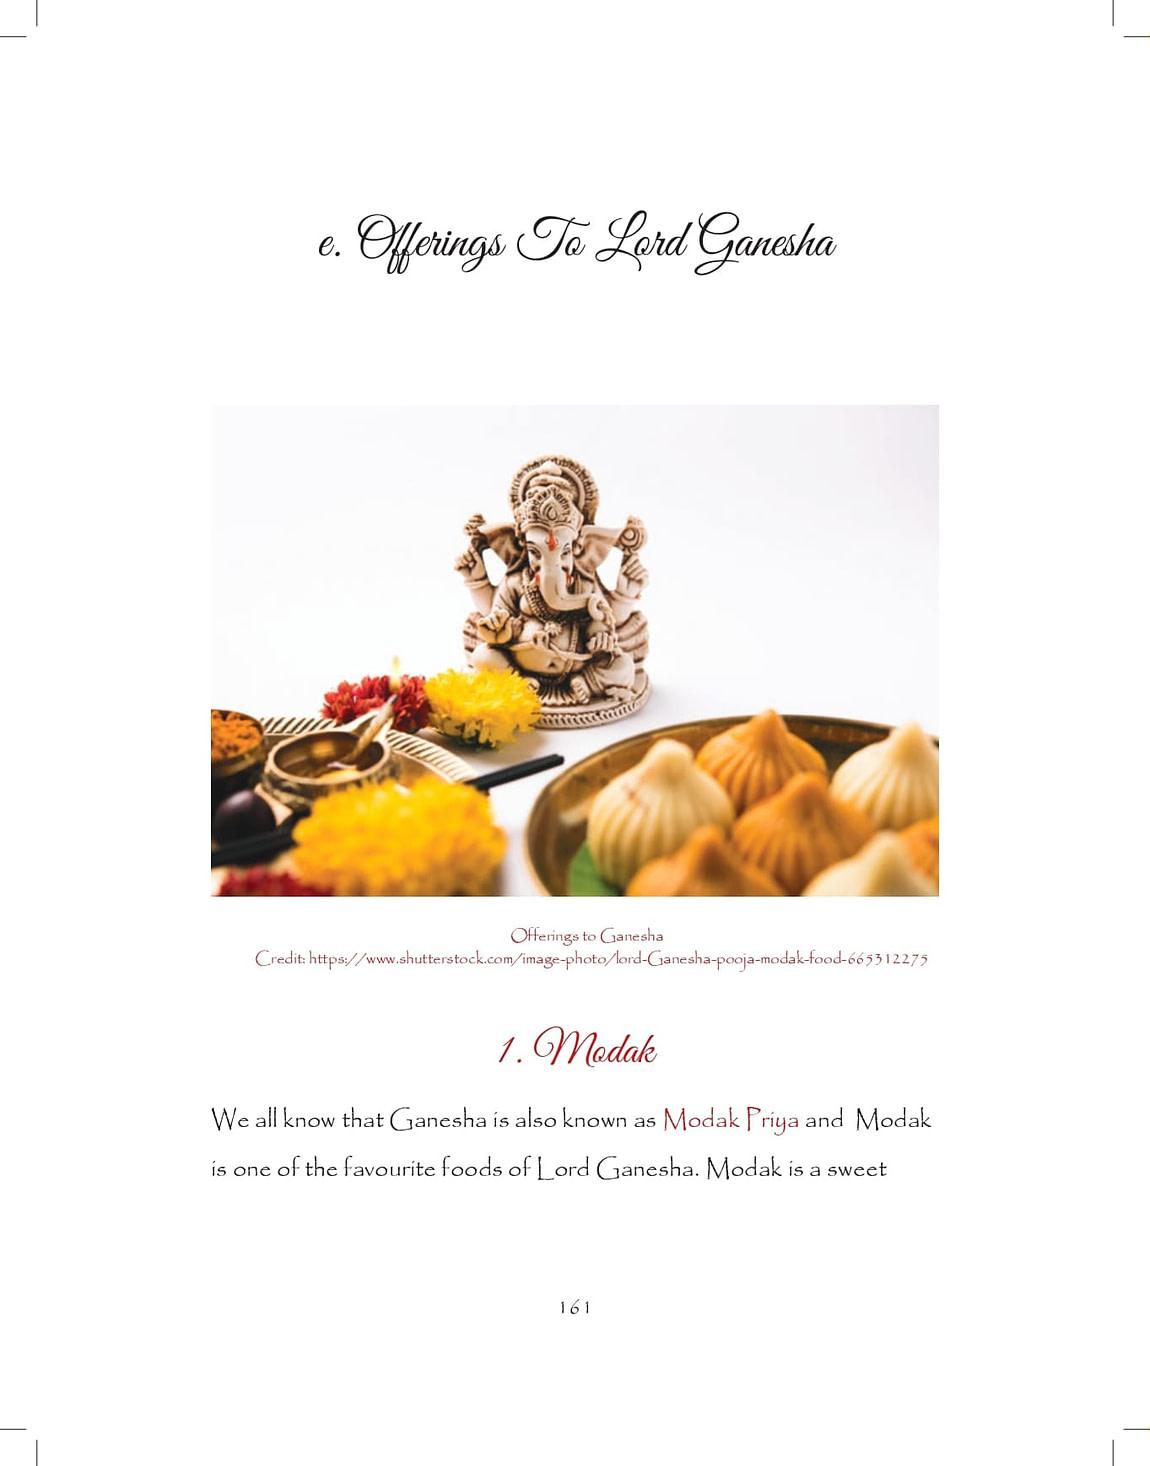 Ganesh-print_pages-to-jpg-0161.jpg